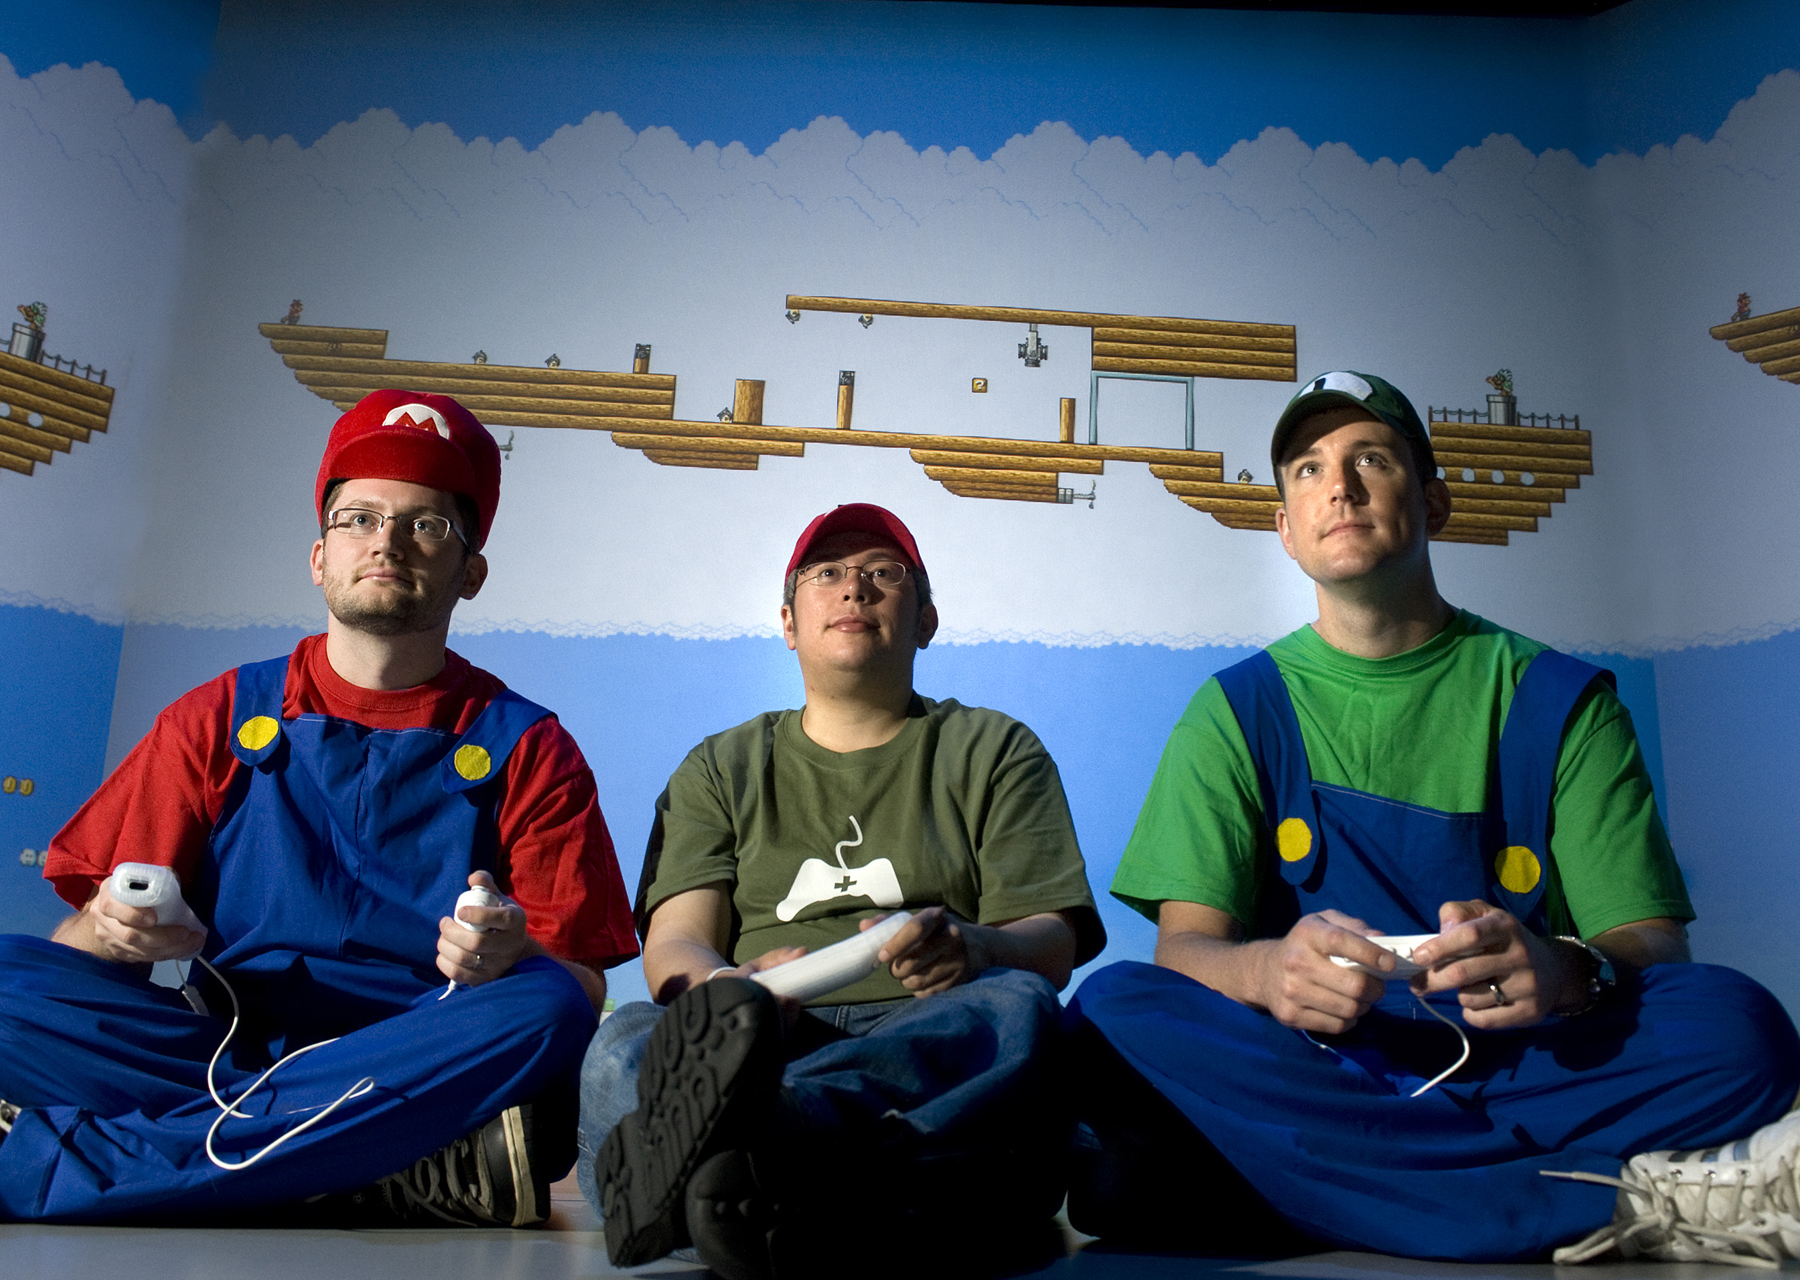 Mario Marathon 5 Begins June 22nd, Good Summer Gaming for a Good Cause